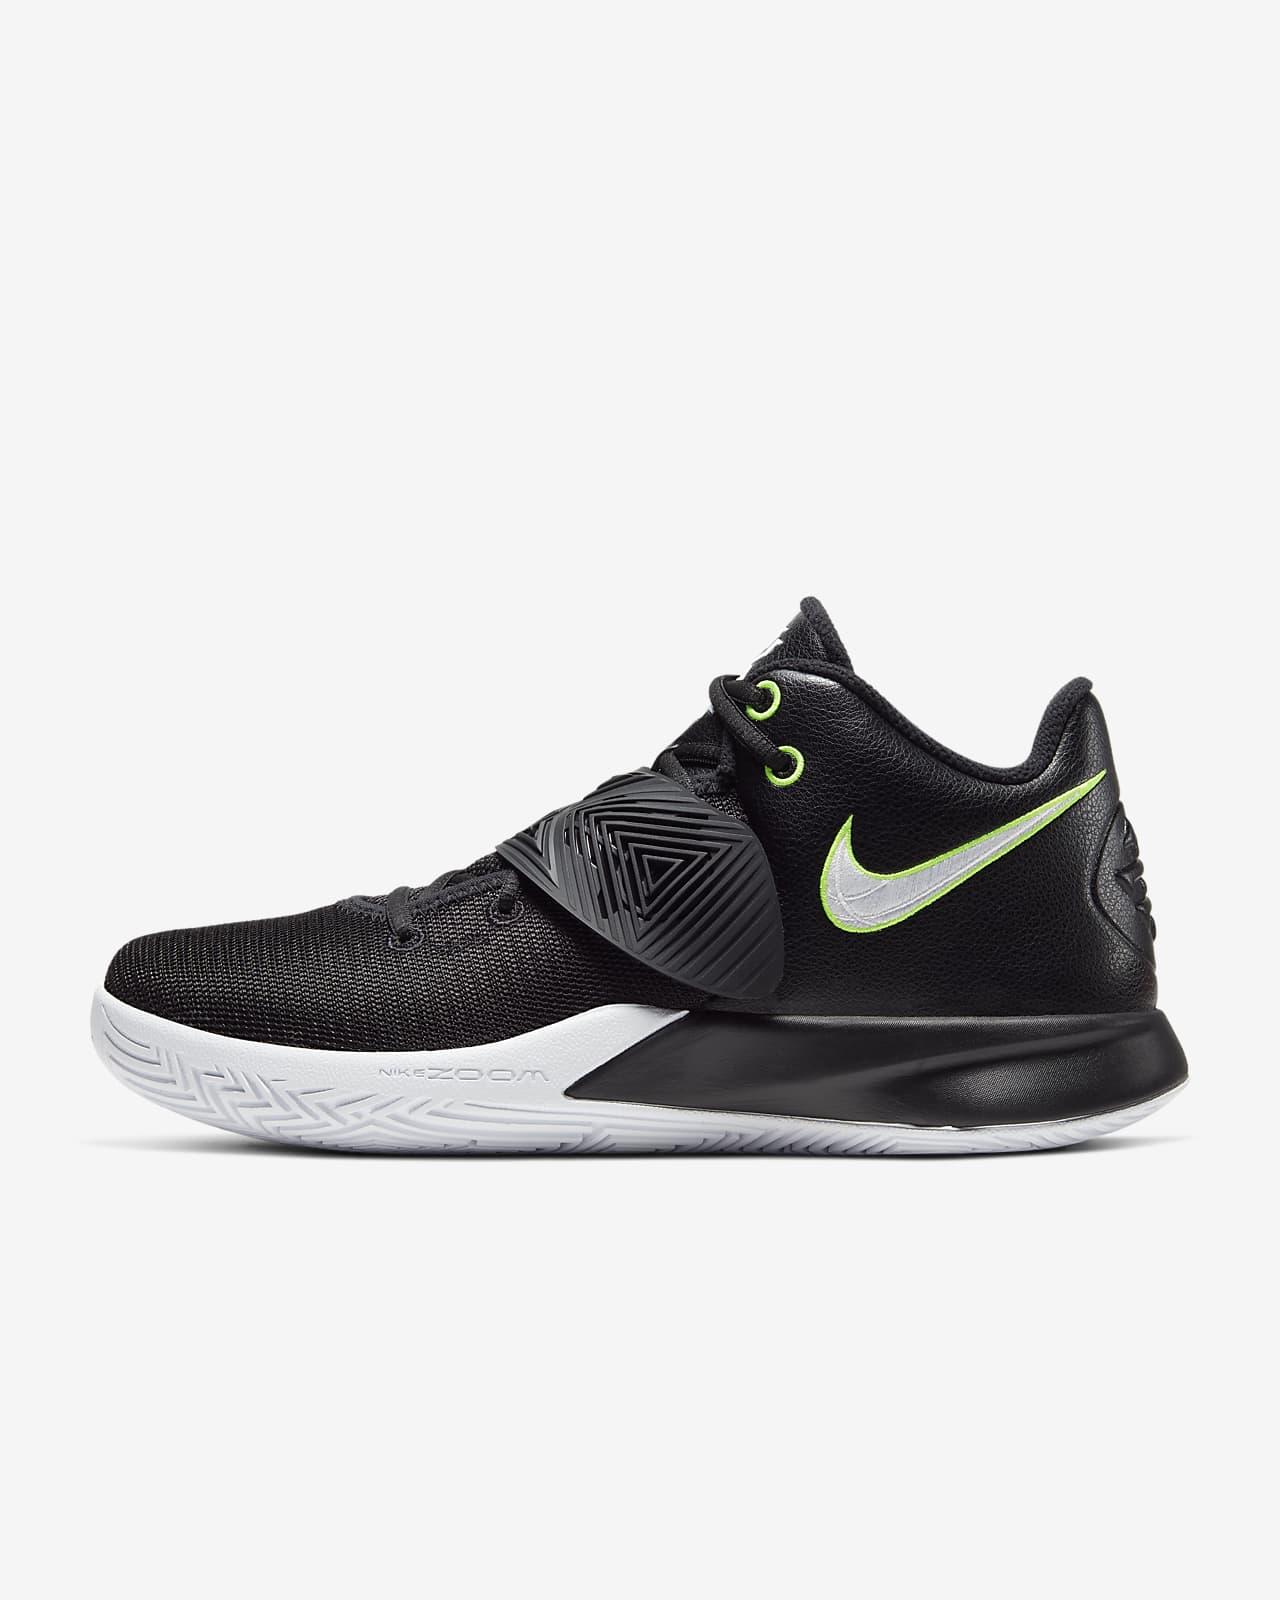 Kyrie Flytrap 3. Nike